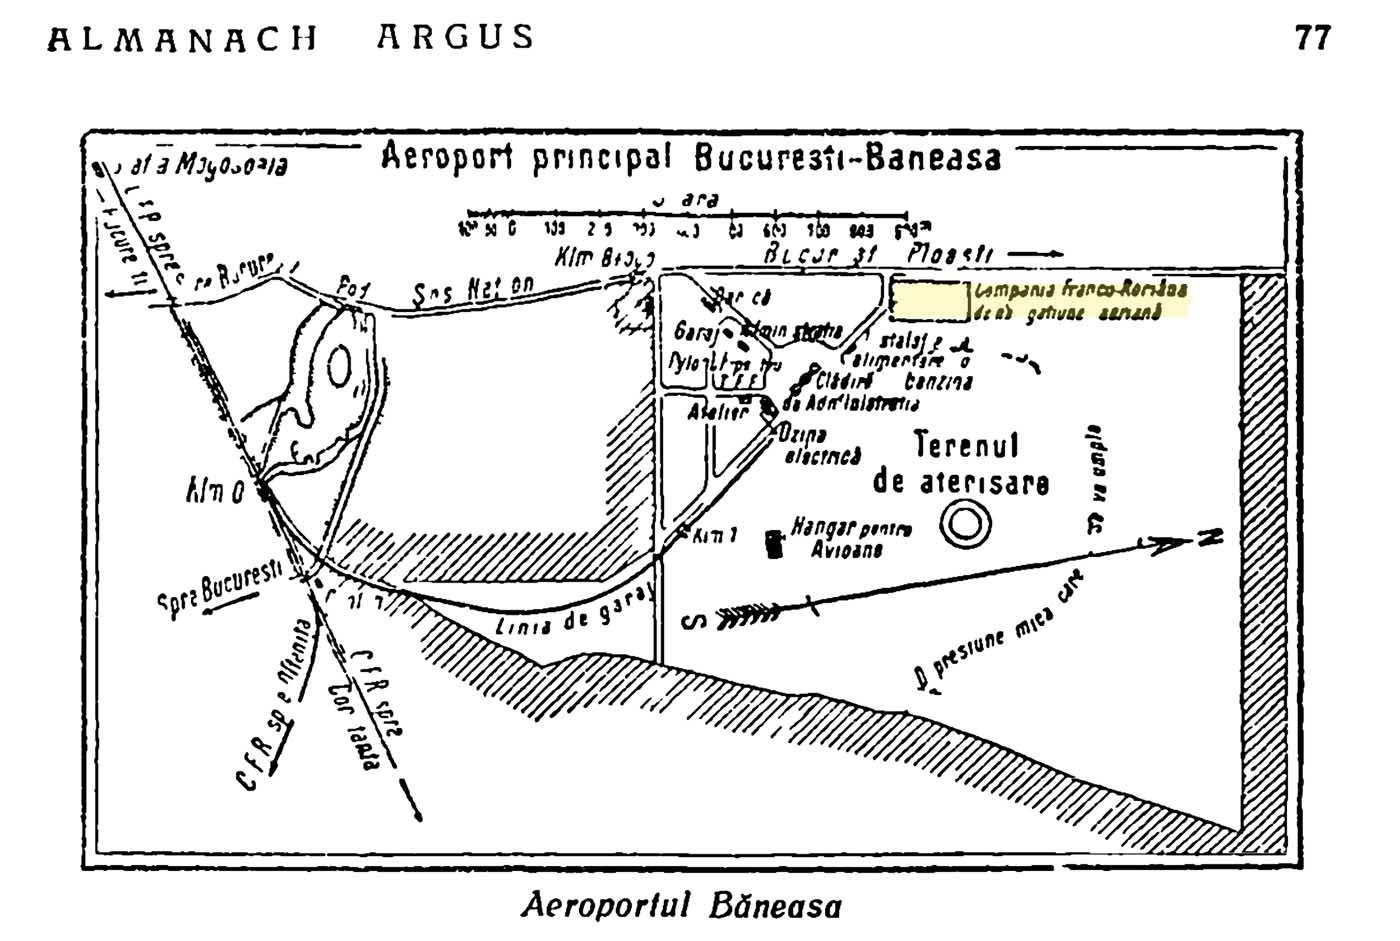 aeroportul Bucuresti - Baneasa | 1925 (sursa: Almanul Argus - 1925, pag. 77)